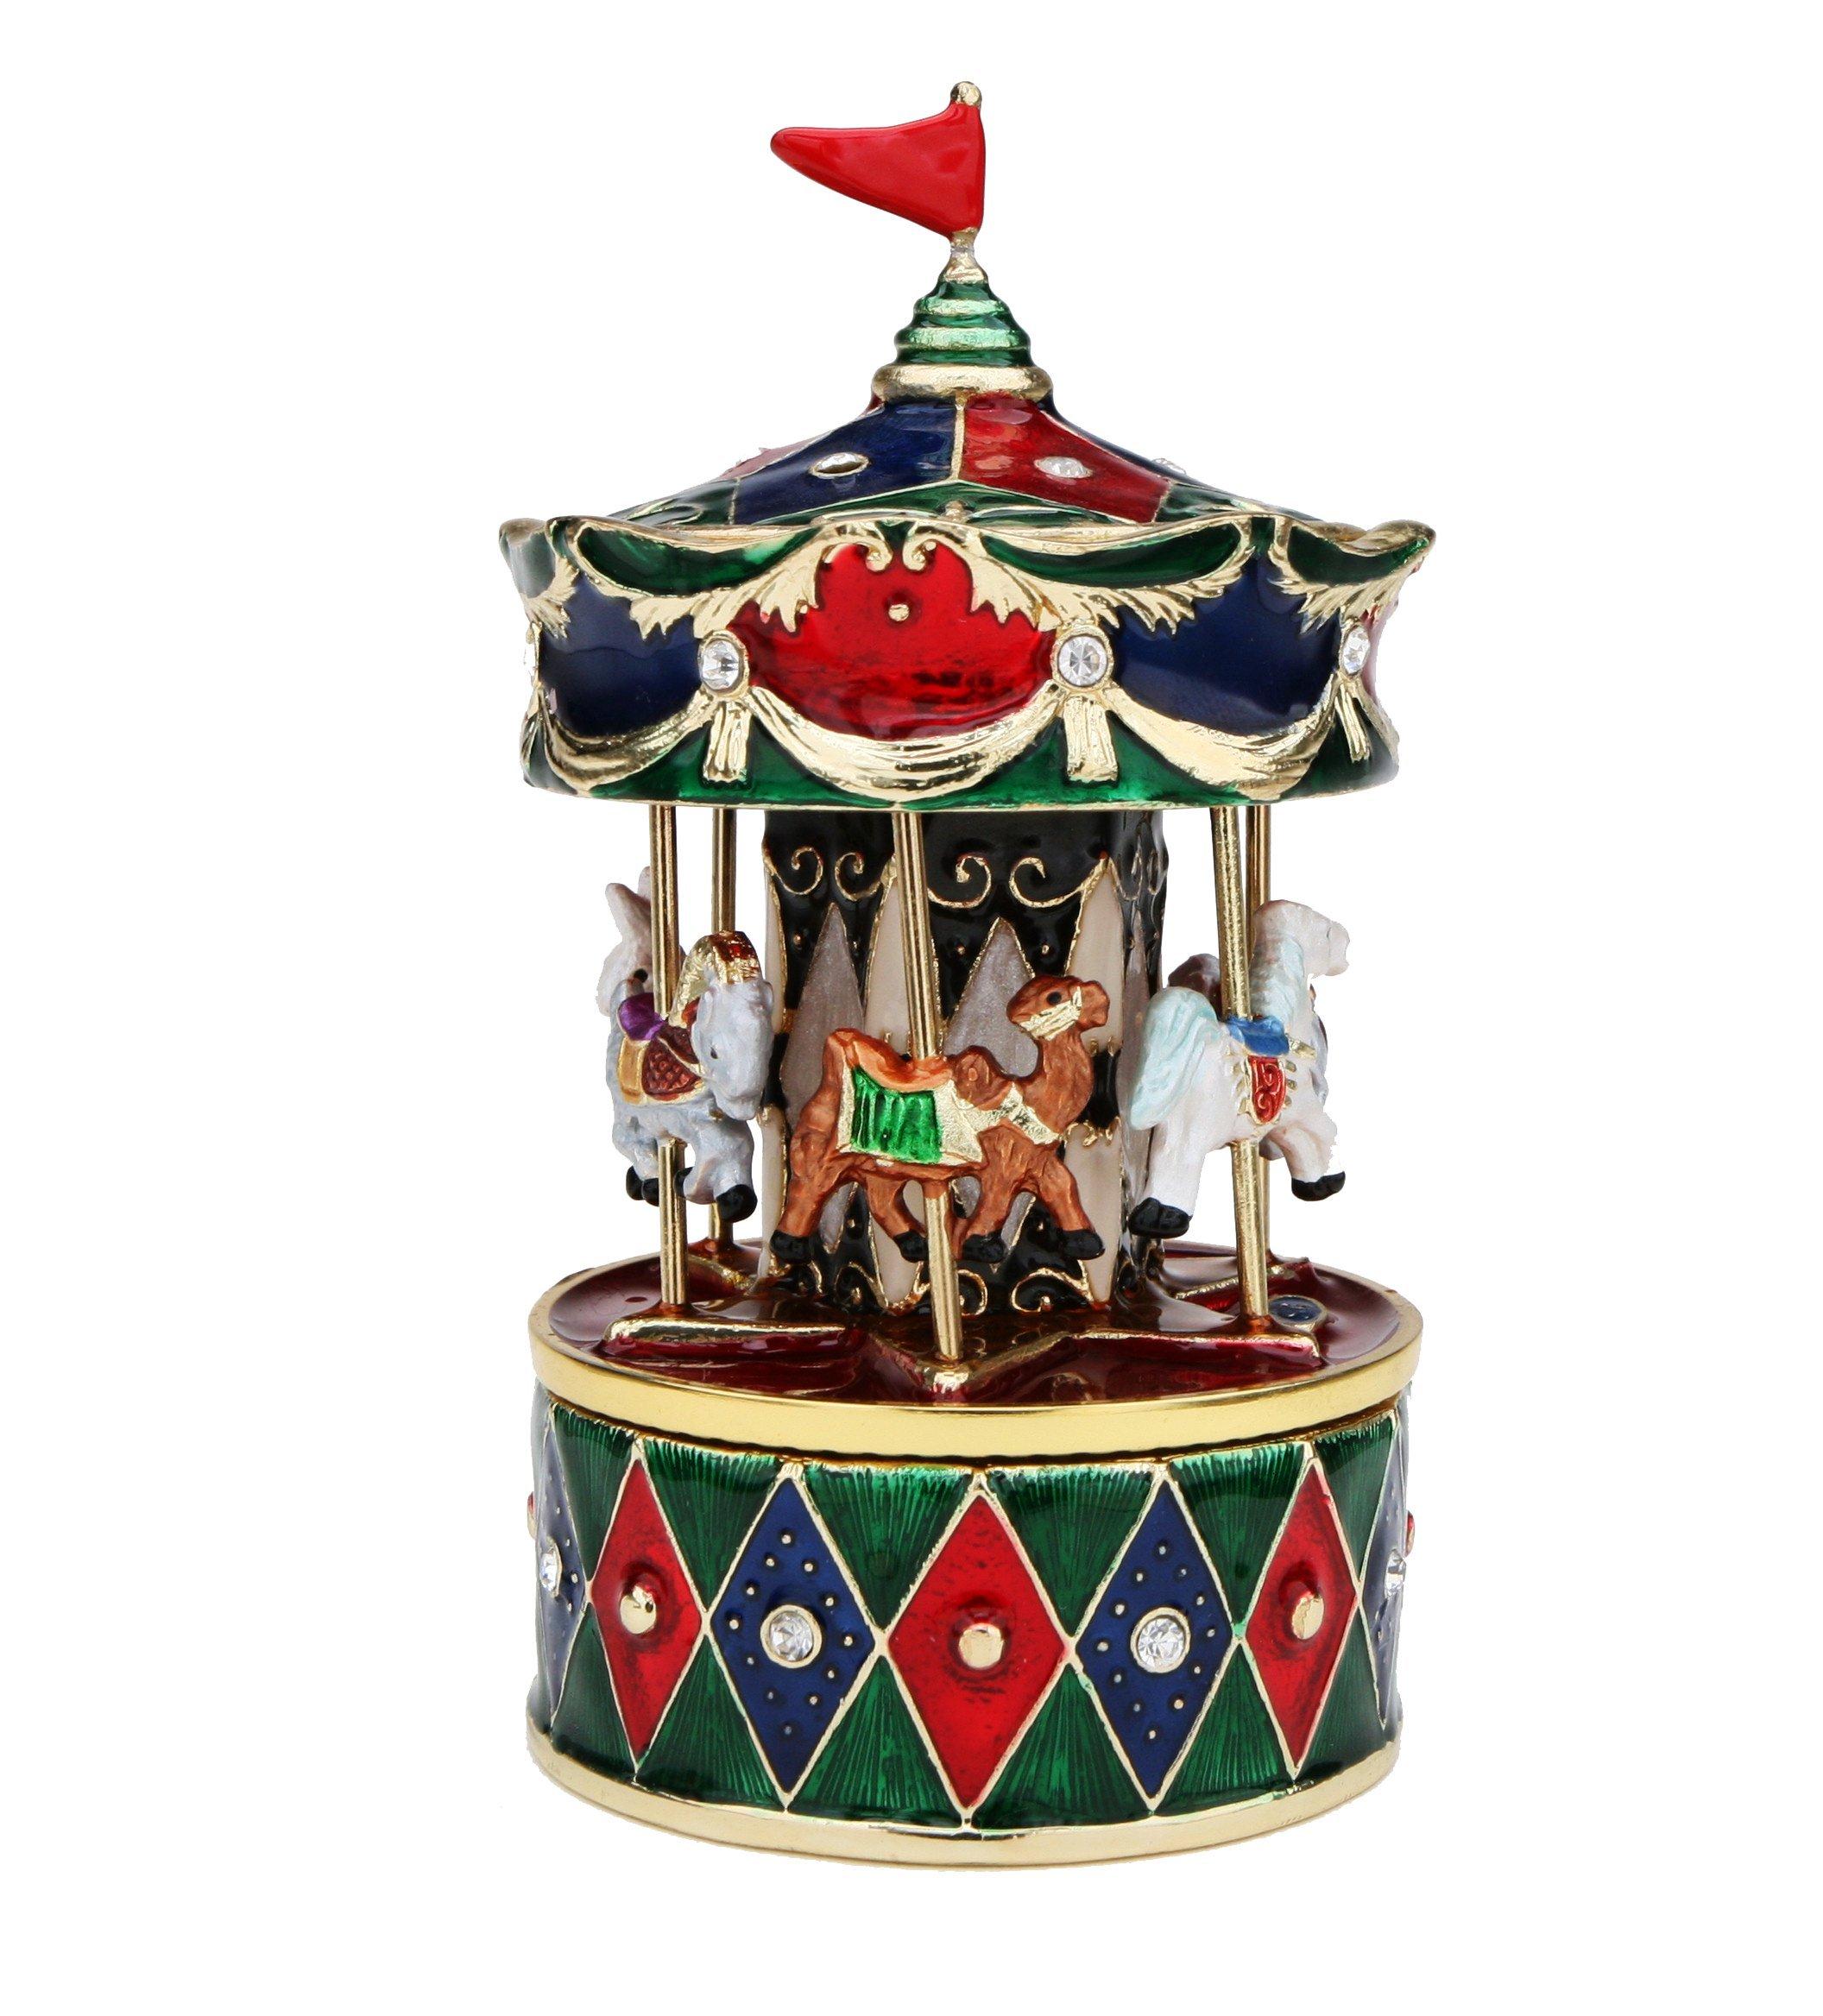 Revolving Animals Carousel Music Box - Plays ''Ave Maria''